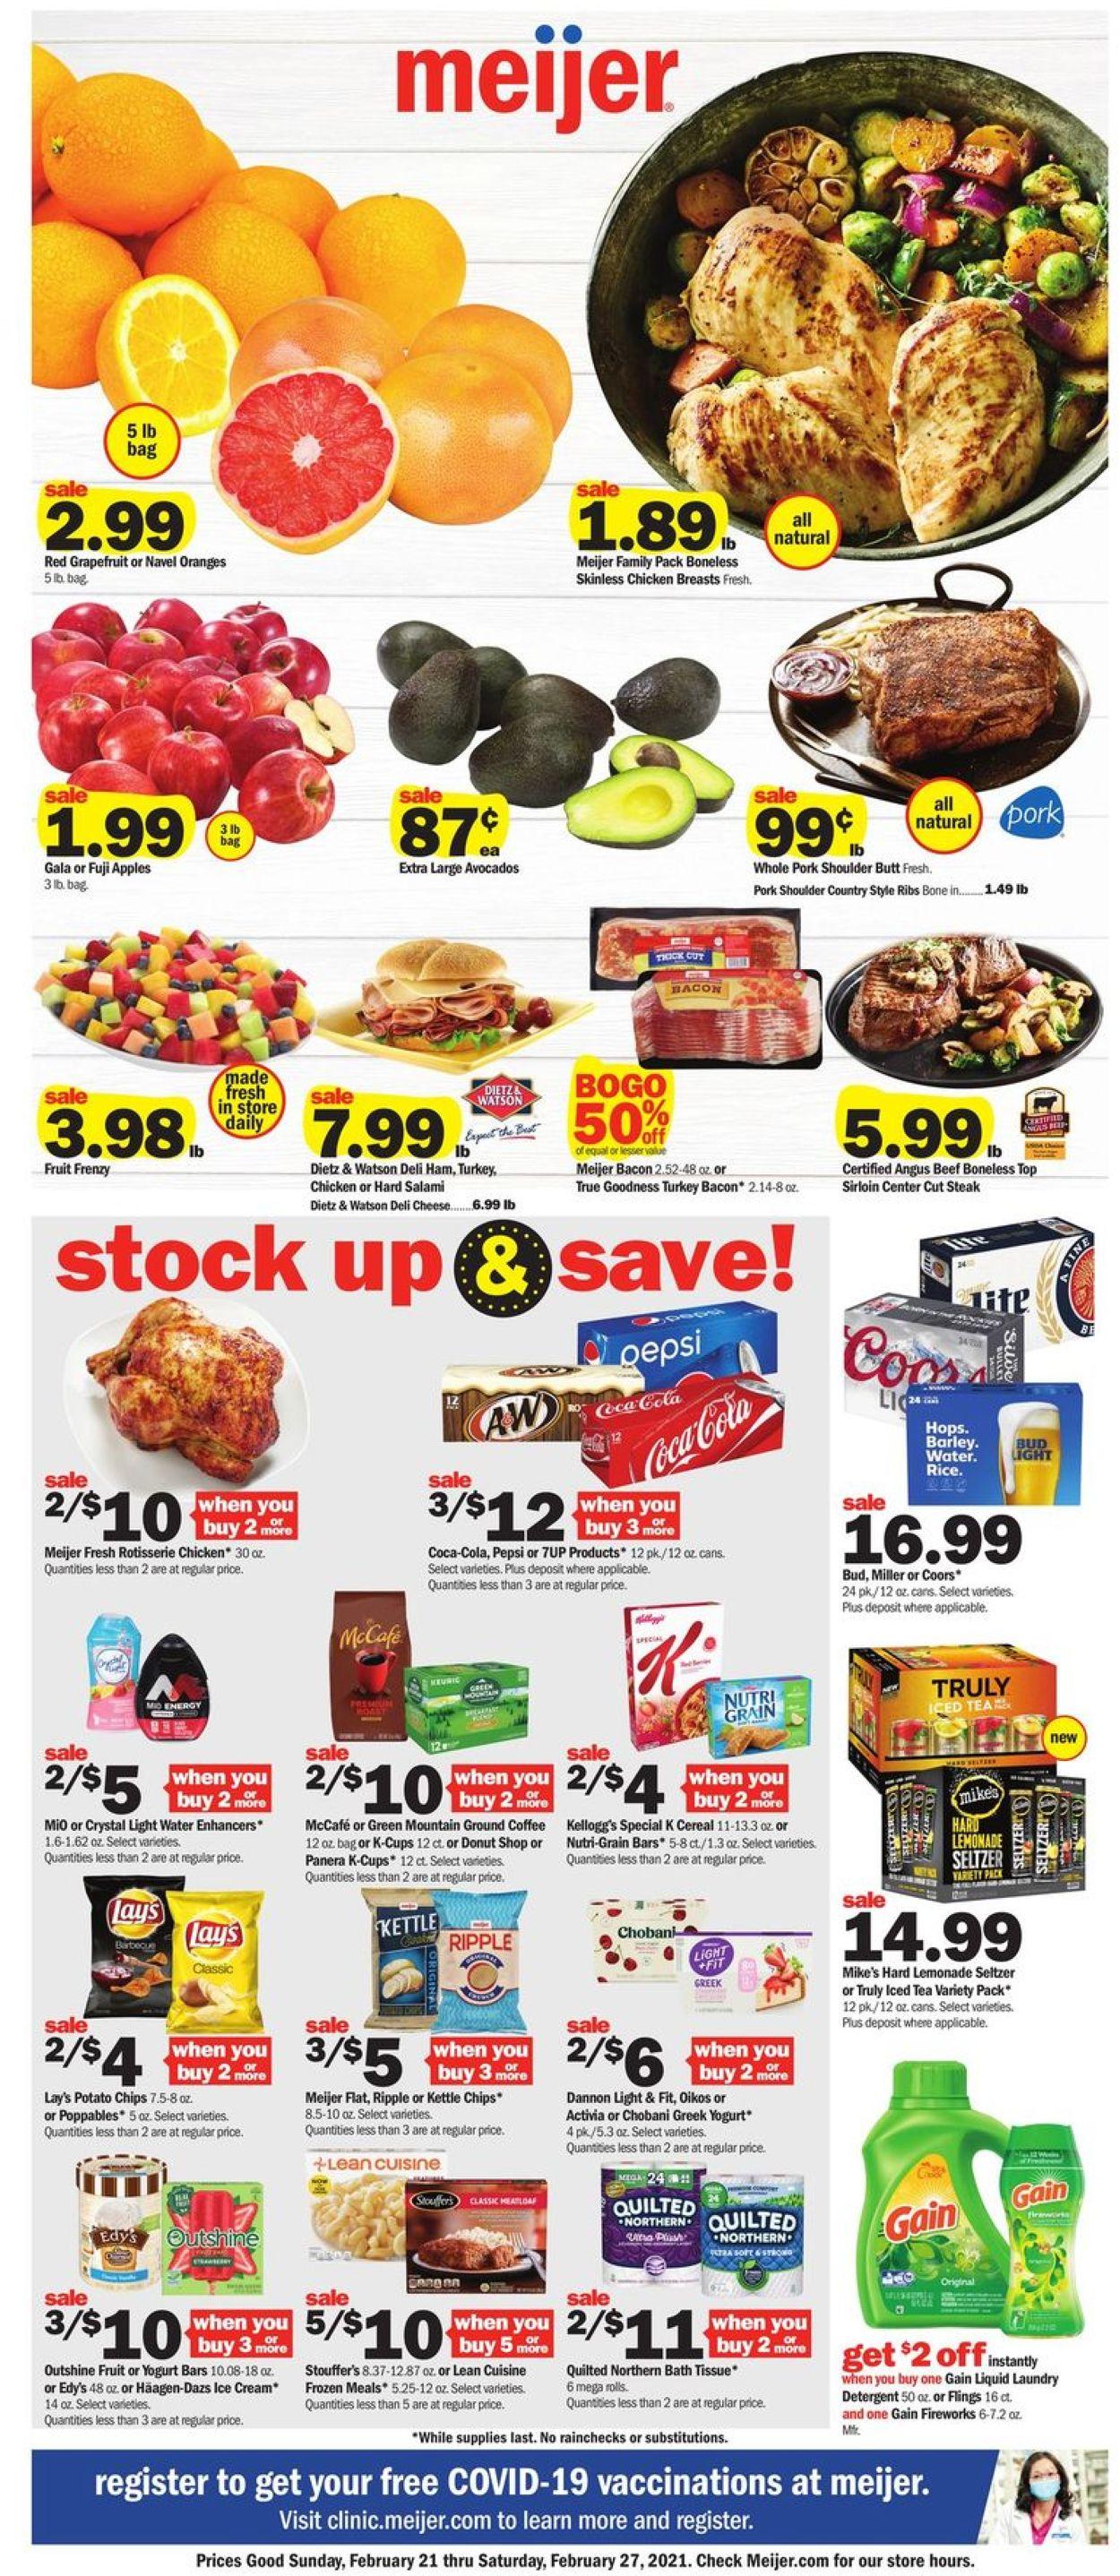 Meijer Weekly Ad Circular - valid 02/21-02/27/2021